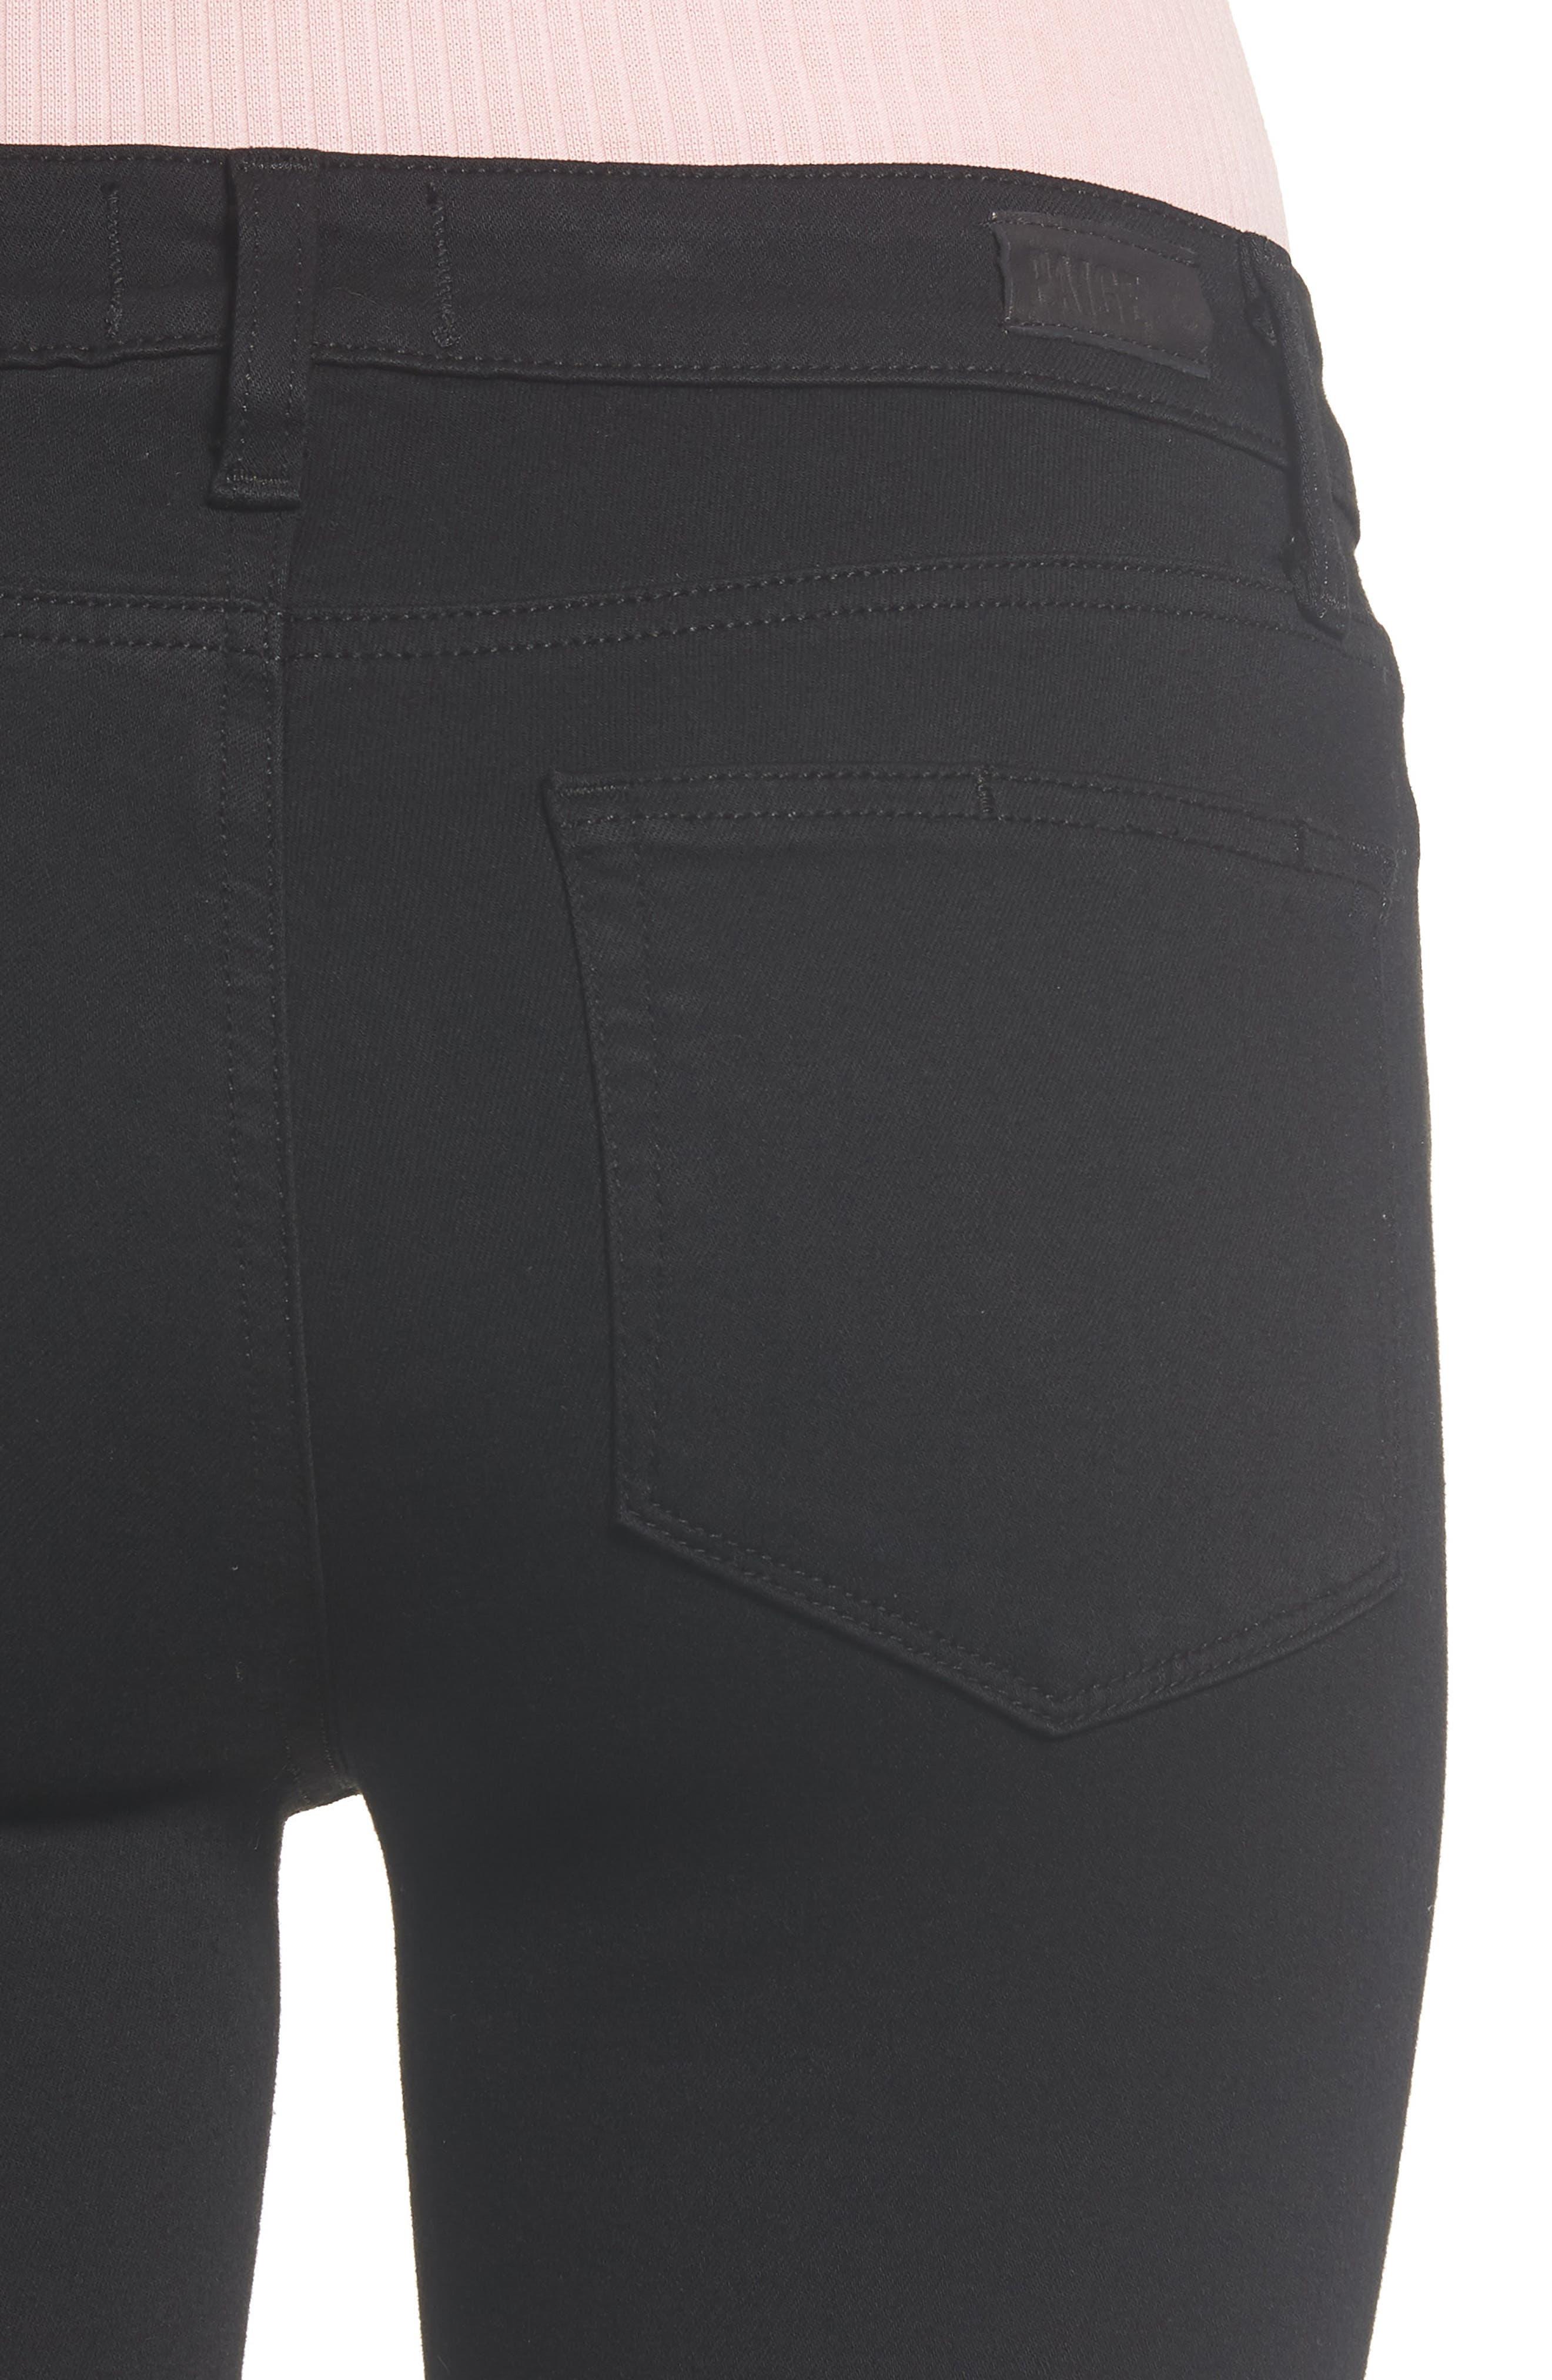 Transcend - Verdugo Ankle Ultra Skinny Jeans,                             Alternate thumbnail 6, color,                             BLACK SHADOW